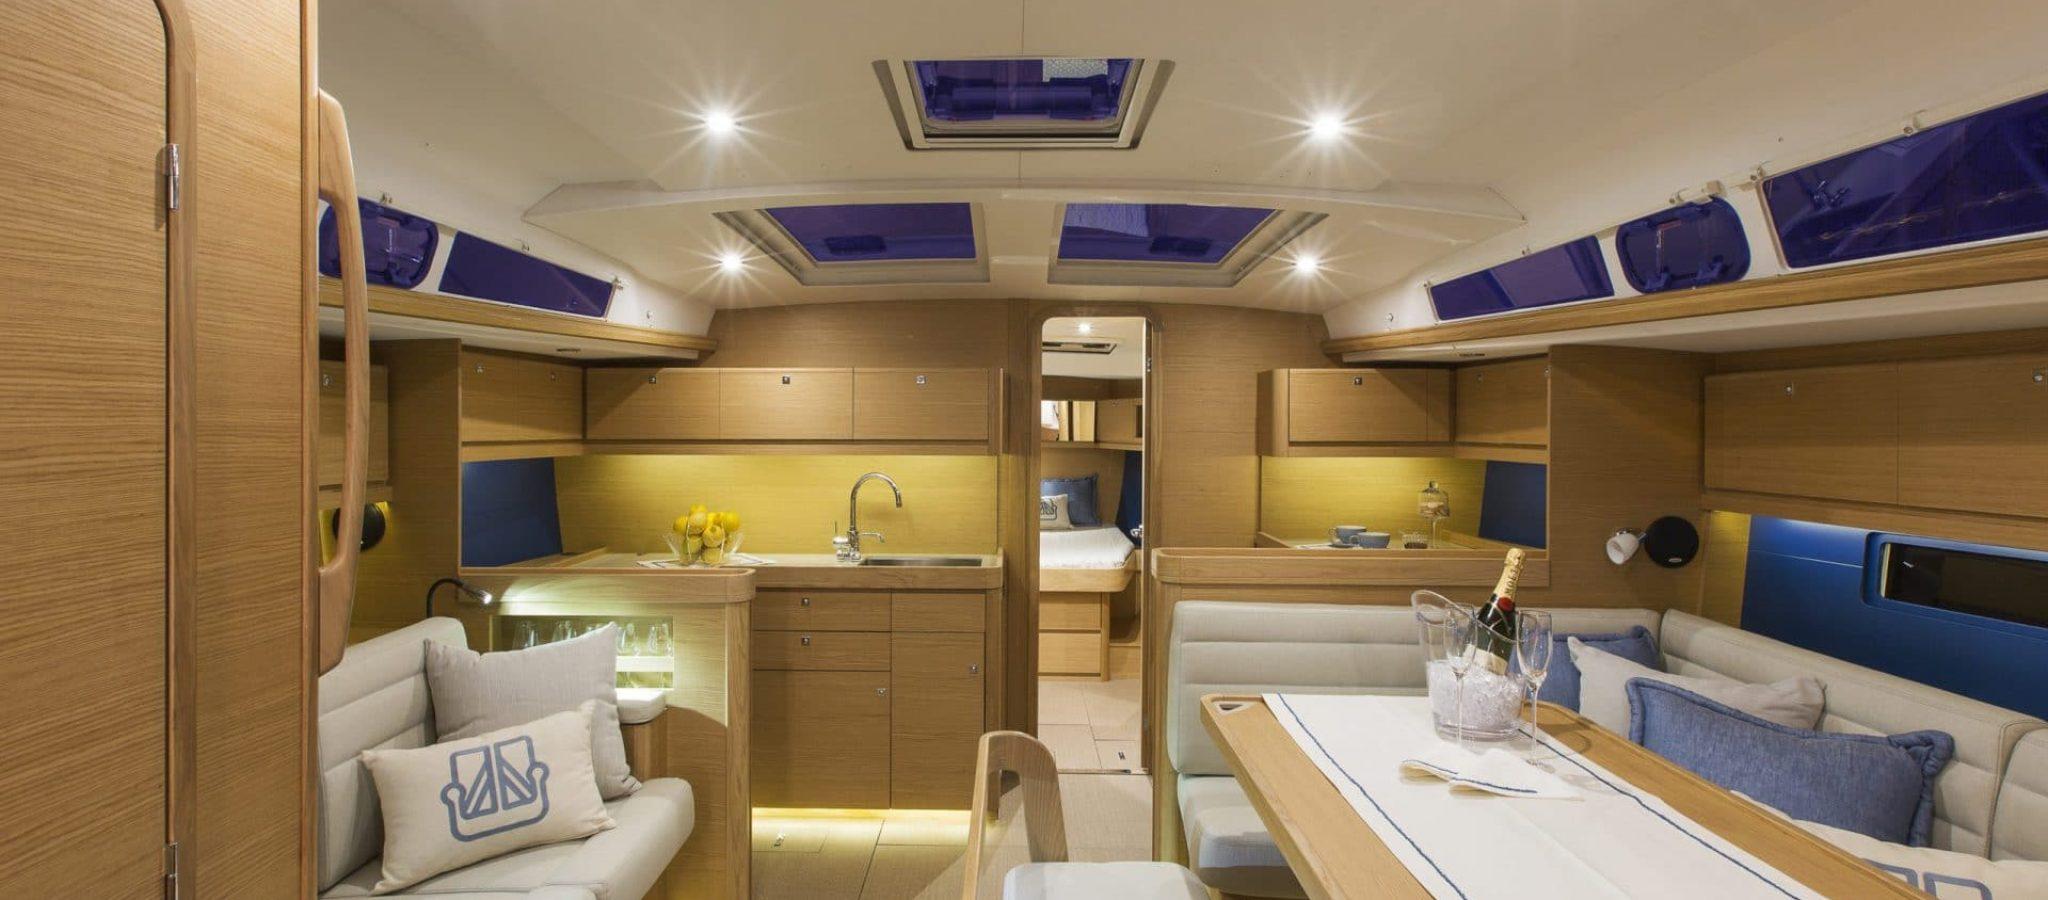 Cannes, 31/08/2015. Photoshoot new Dufour Yachts model, Dufour 460, Photo © Jean Marie Liot / Dufour Yachts